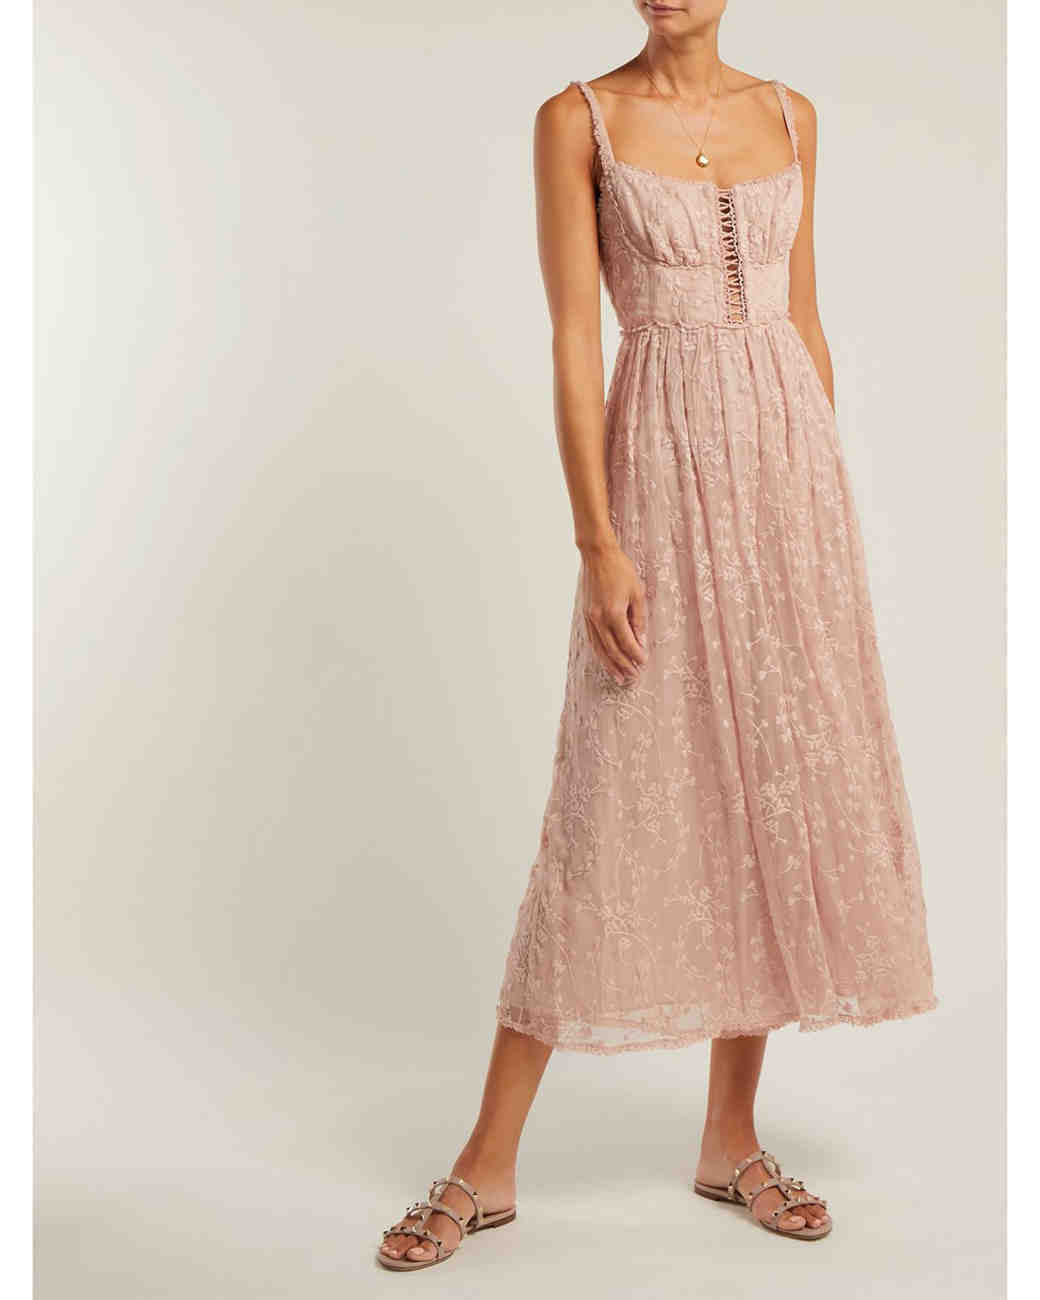 fe366a032fce 15 Chic Bridesmaid Jumpsuits | Martha Stewart Weddings